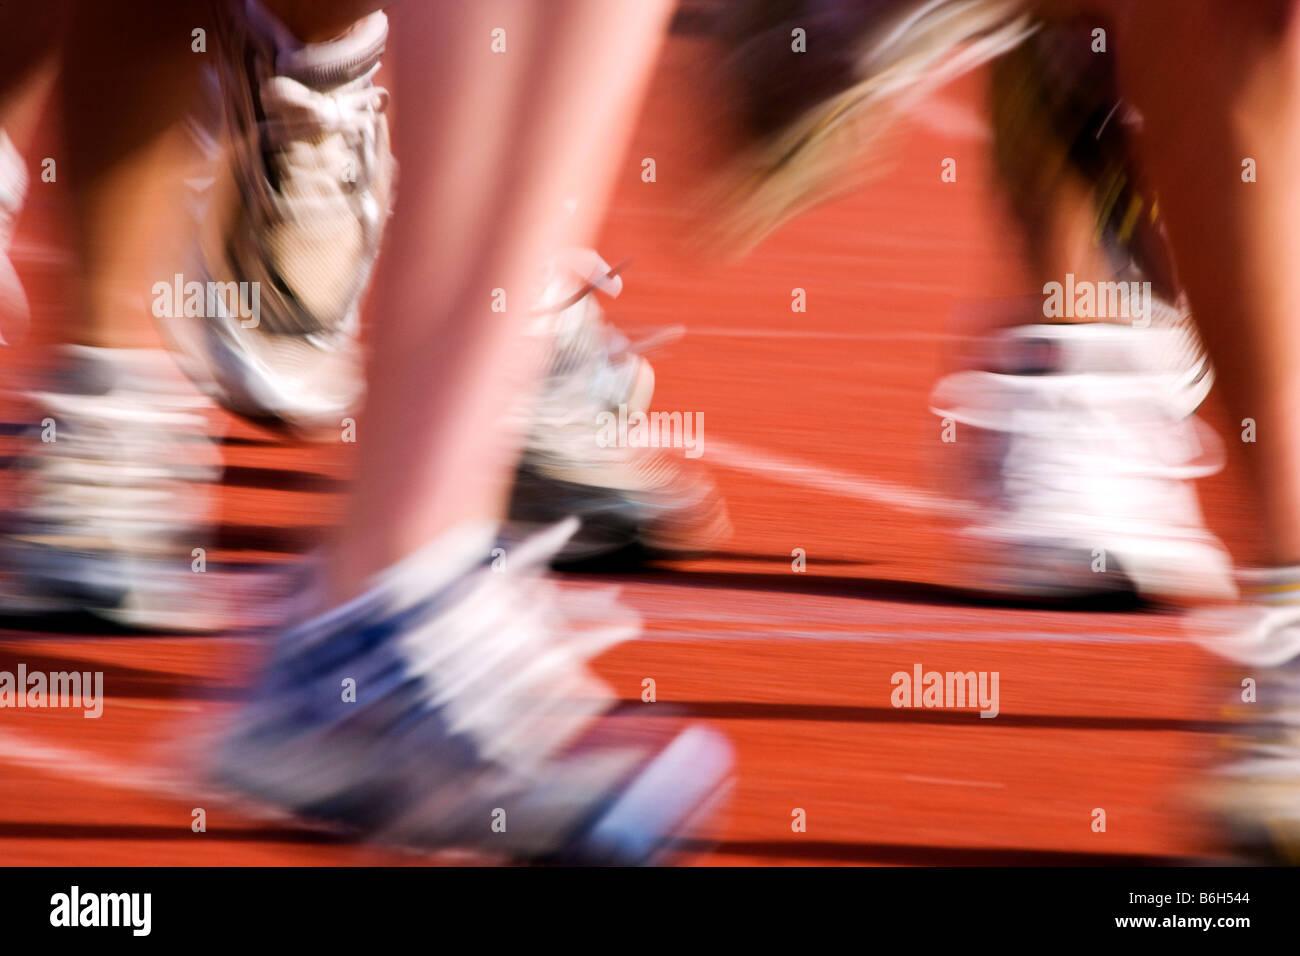 High school track & field meet - Stock Image